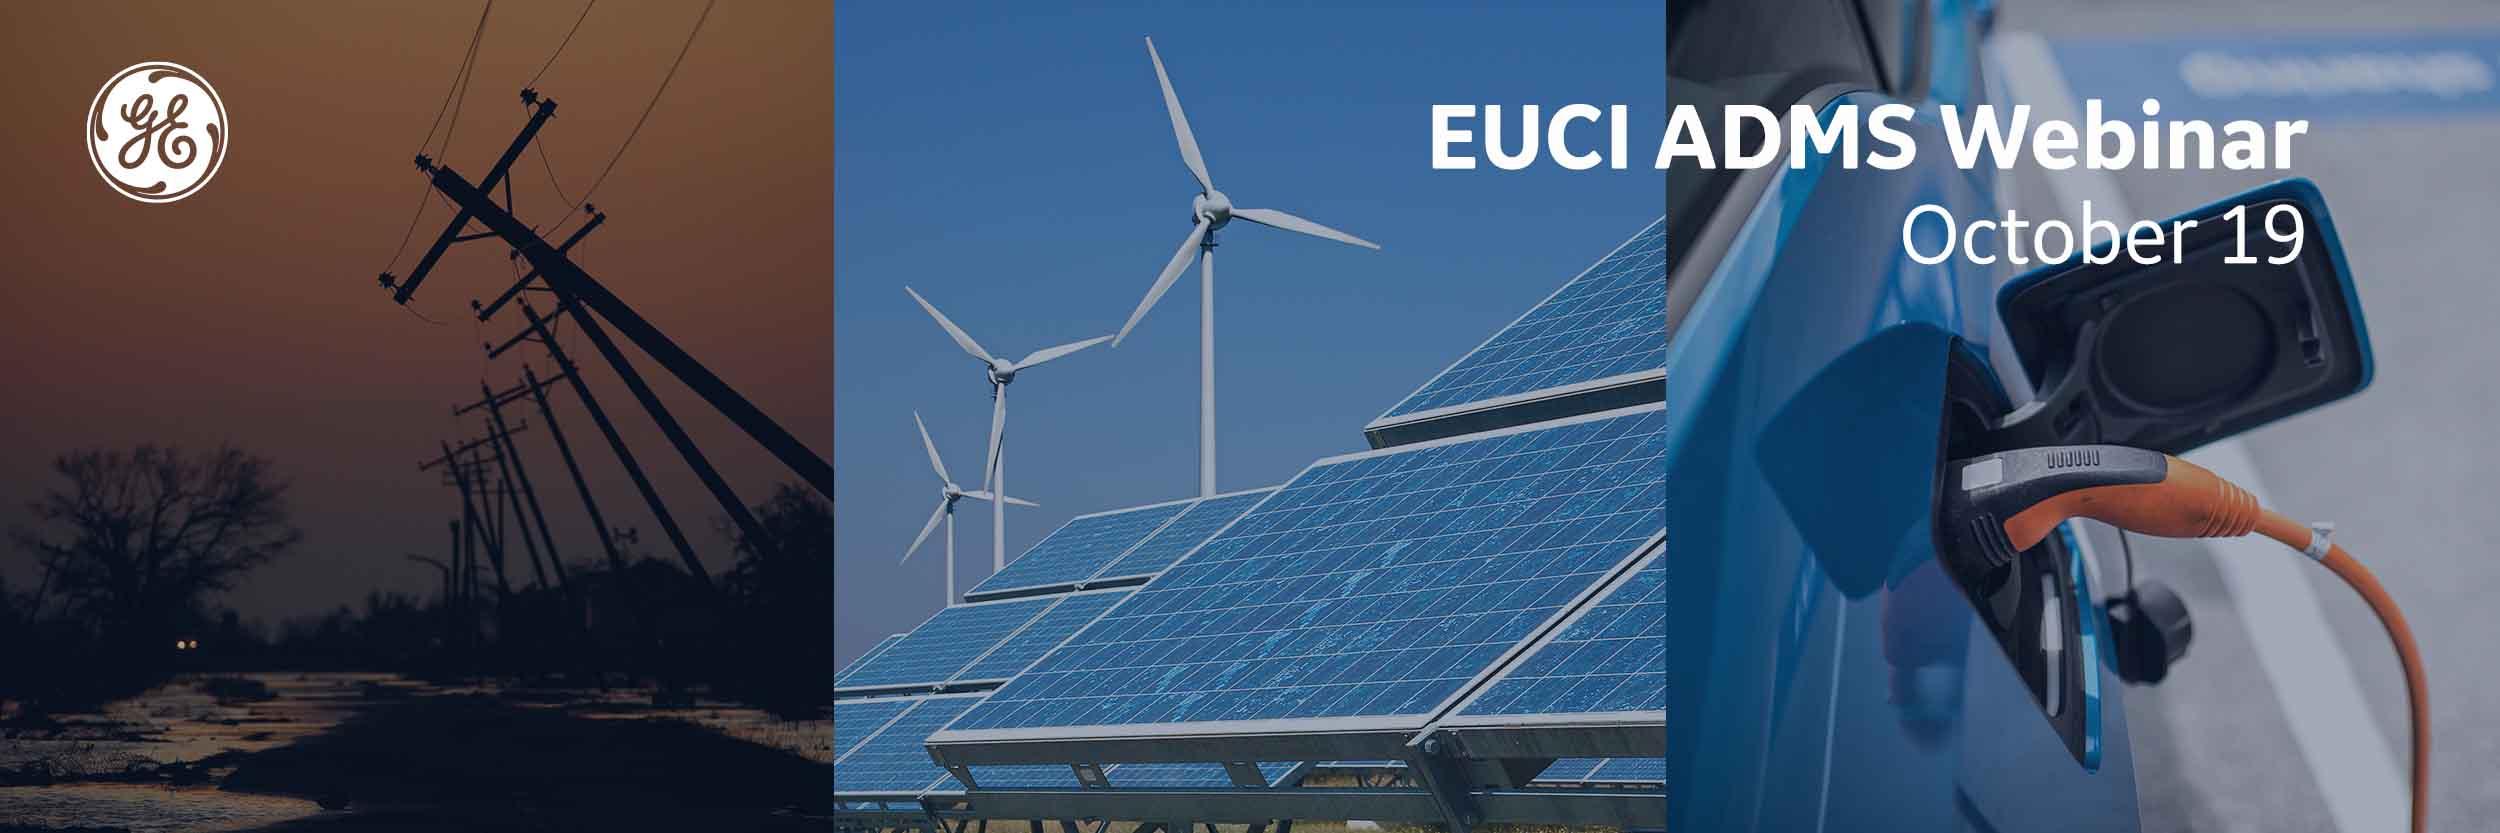 EUCI Event: ADMS Webinar with Alabama Power and GE Digital